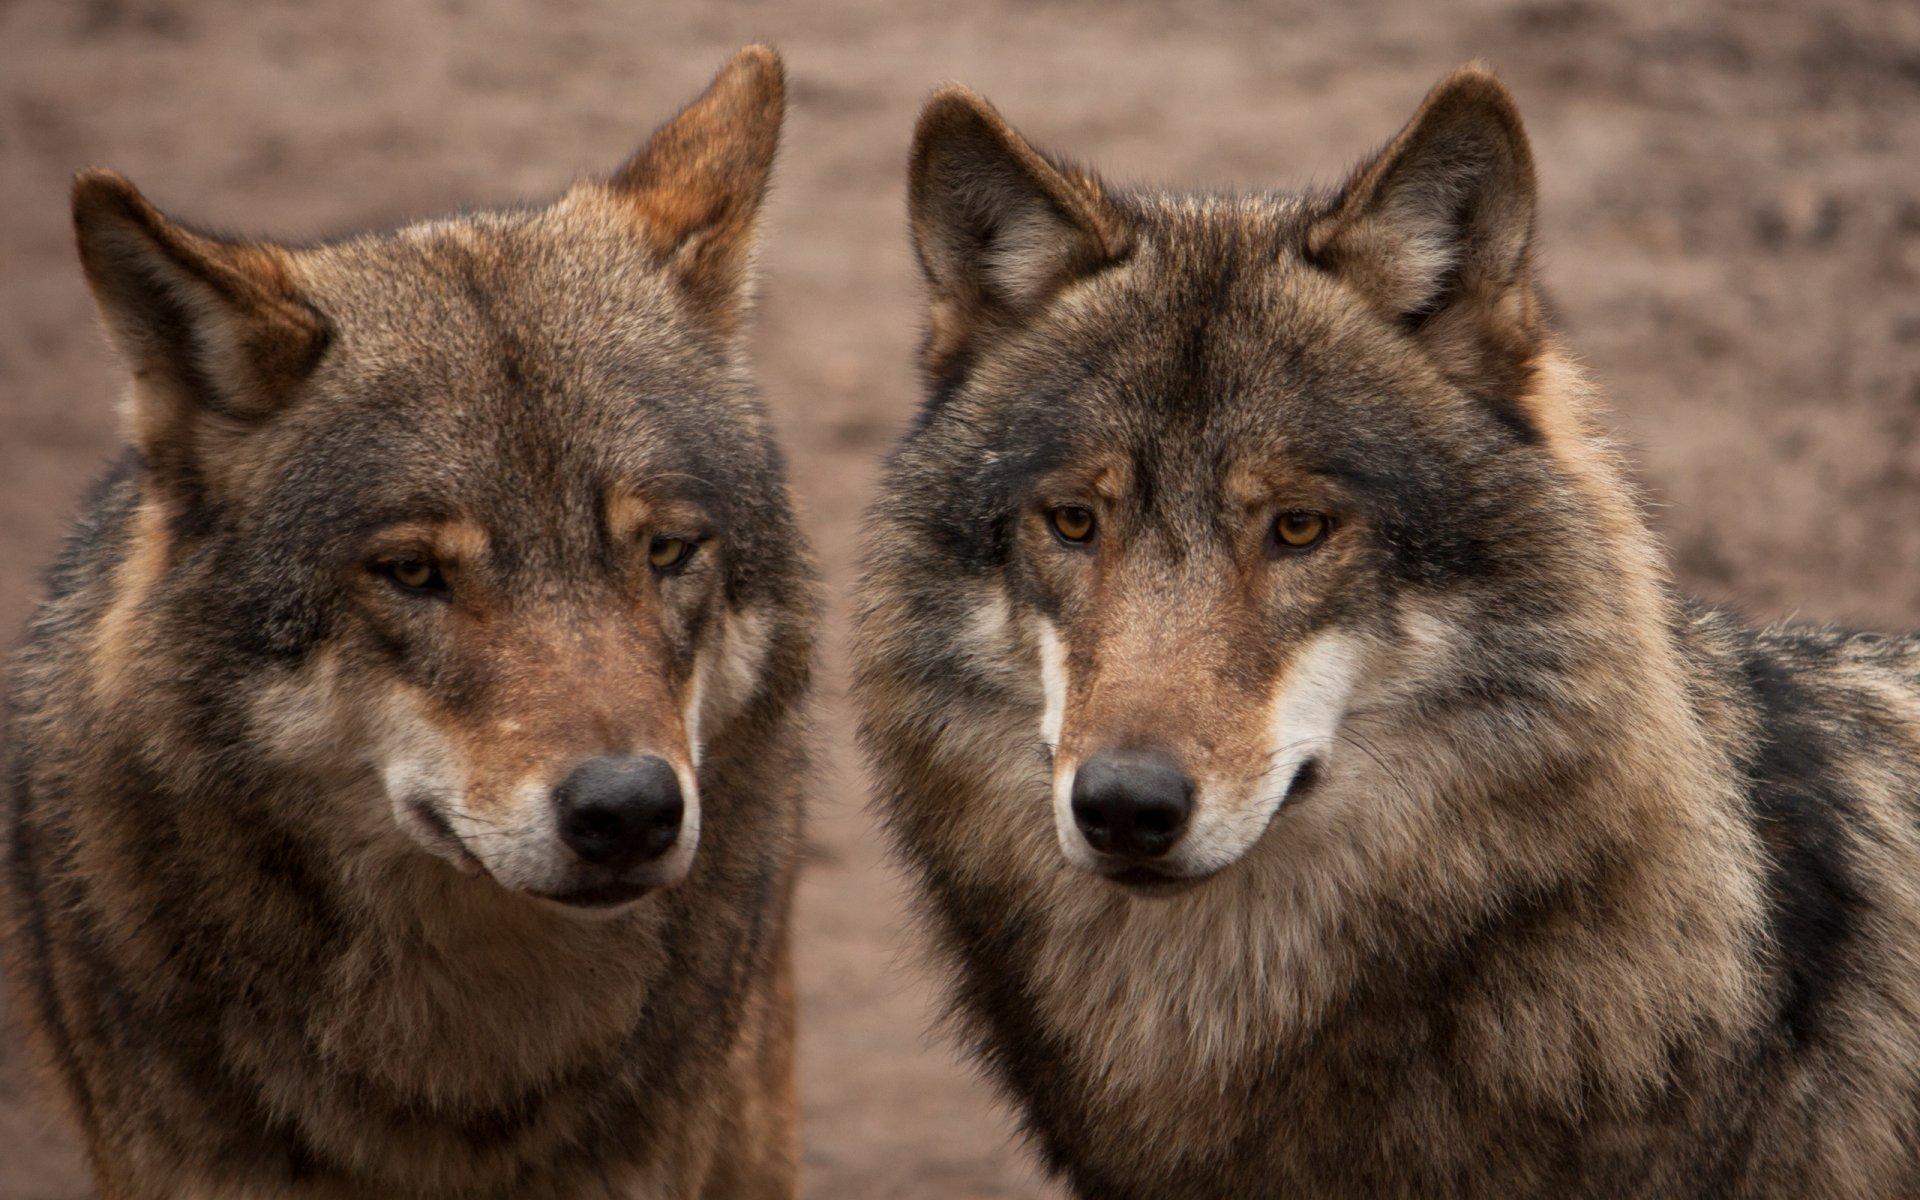 вкусу на телефон фото пара волков ступени дпк